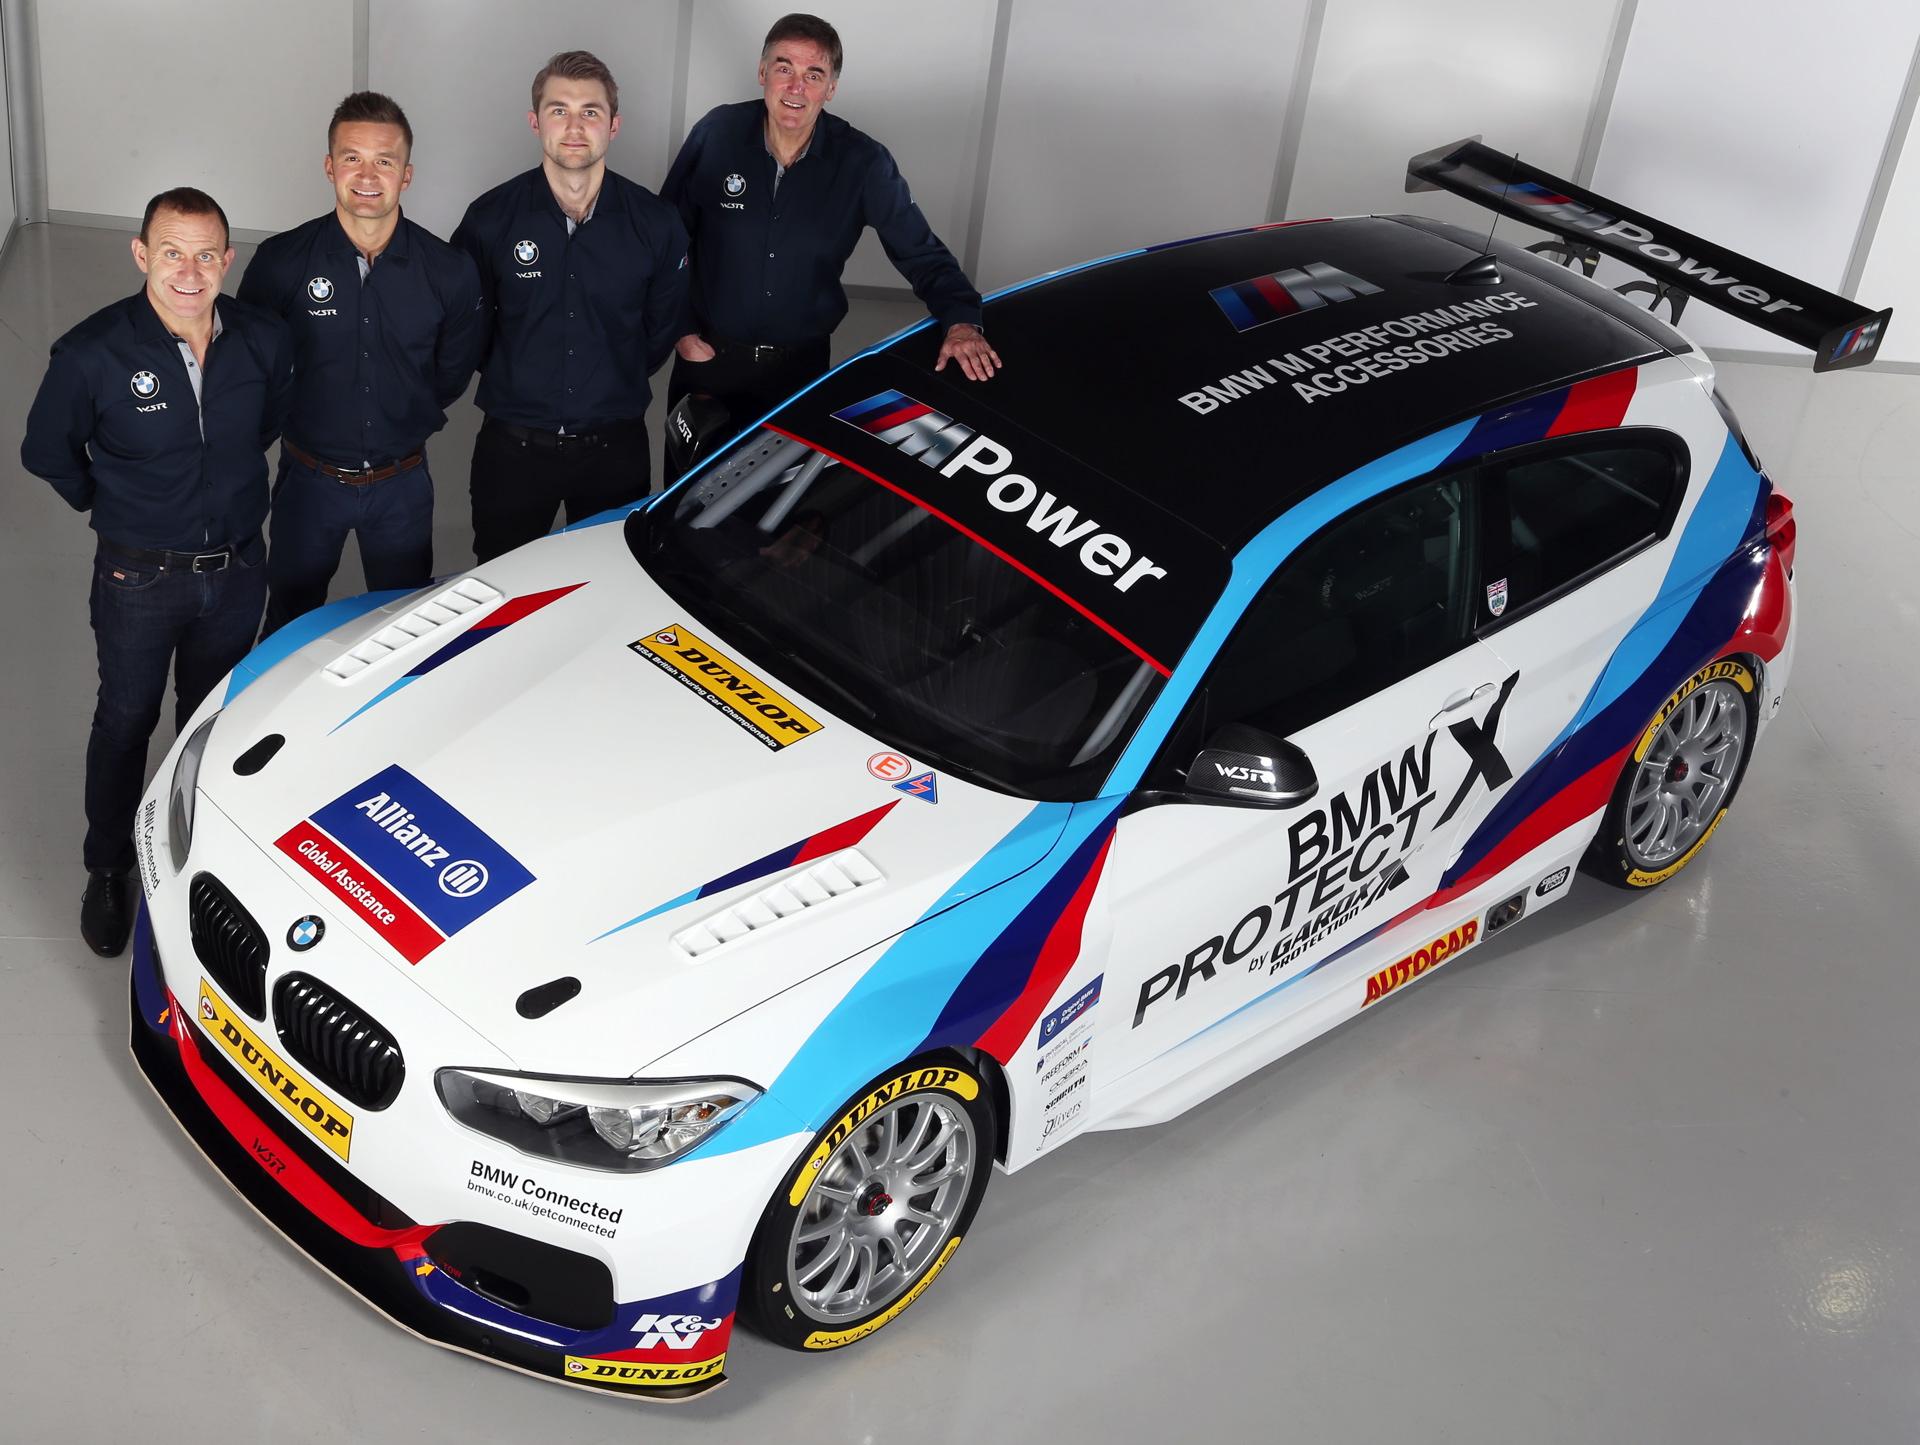 BMW 2017 British Touring Car Championship 05